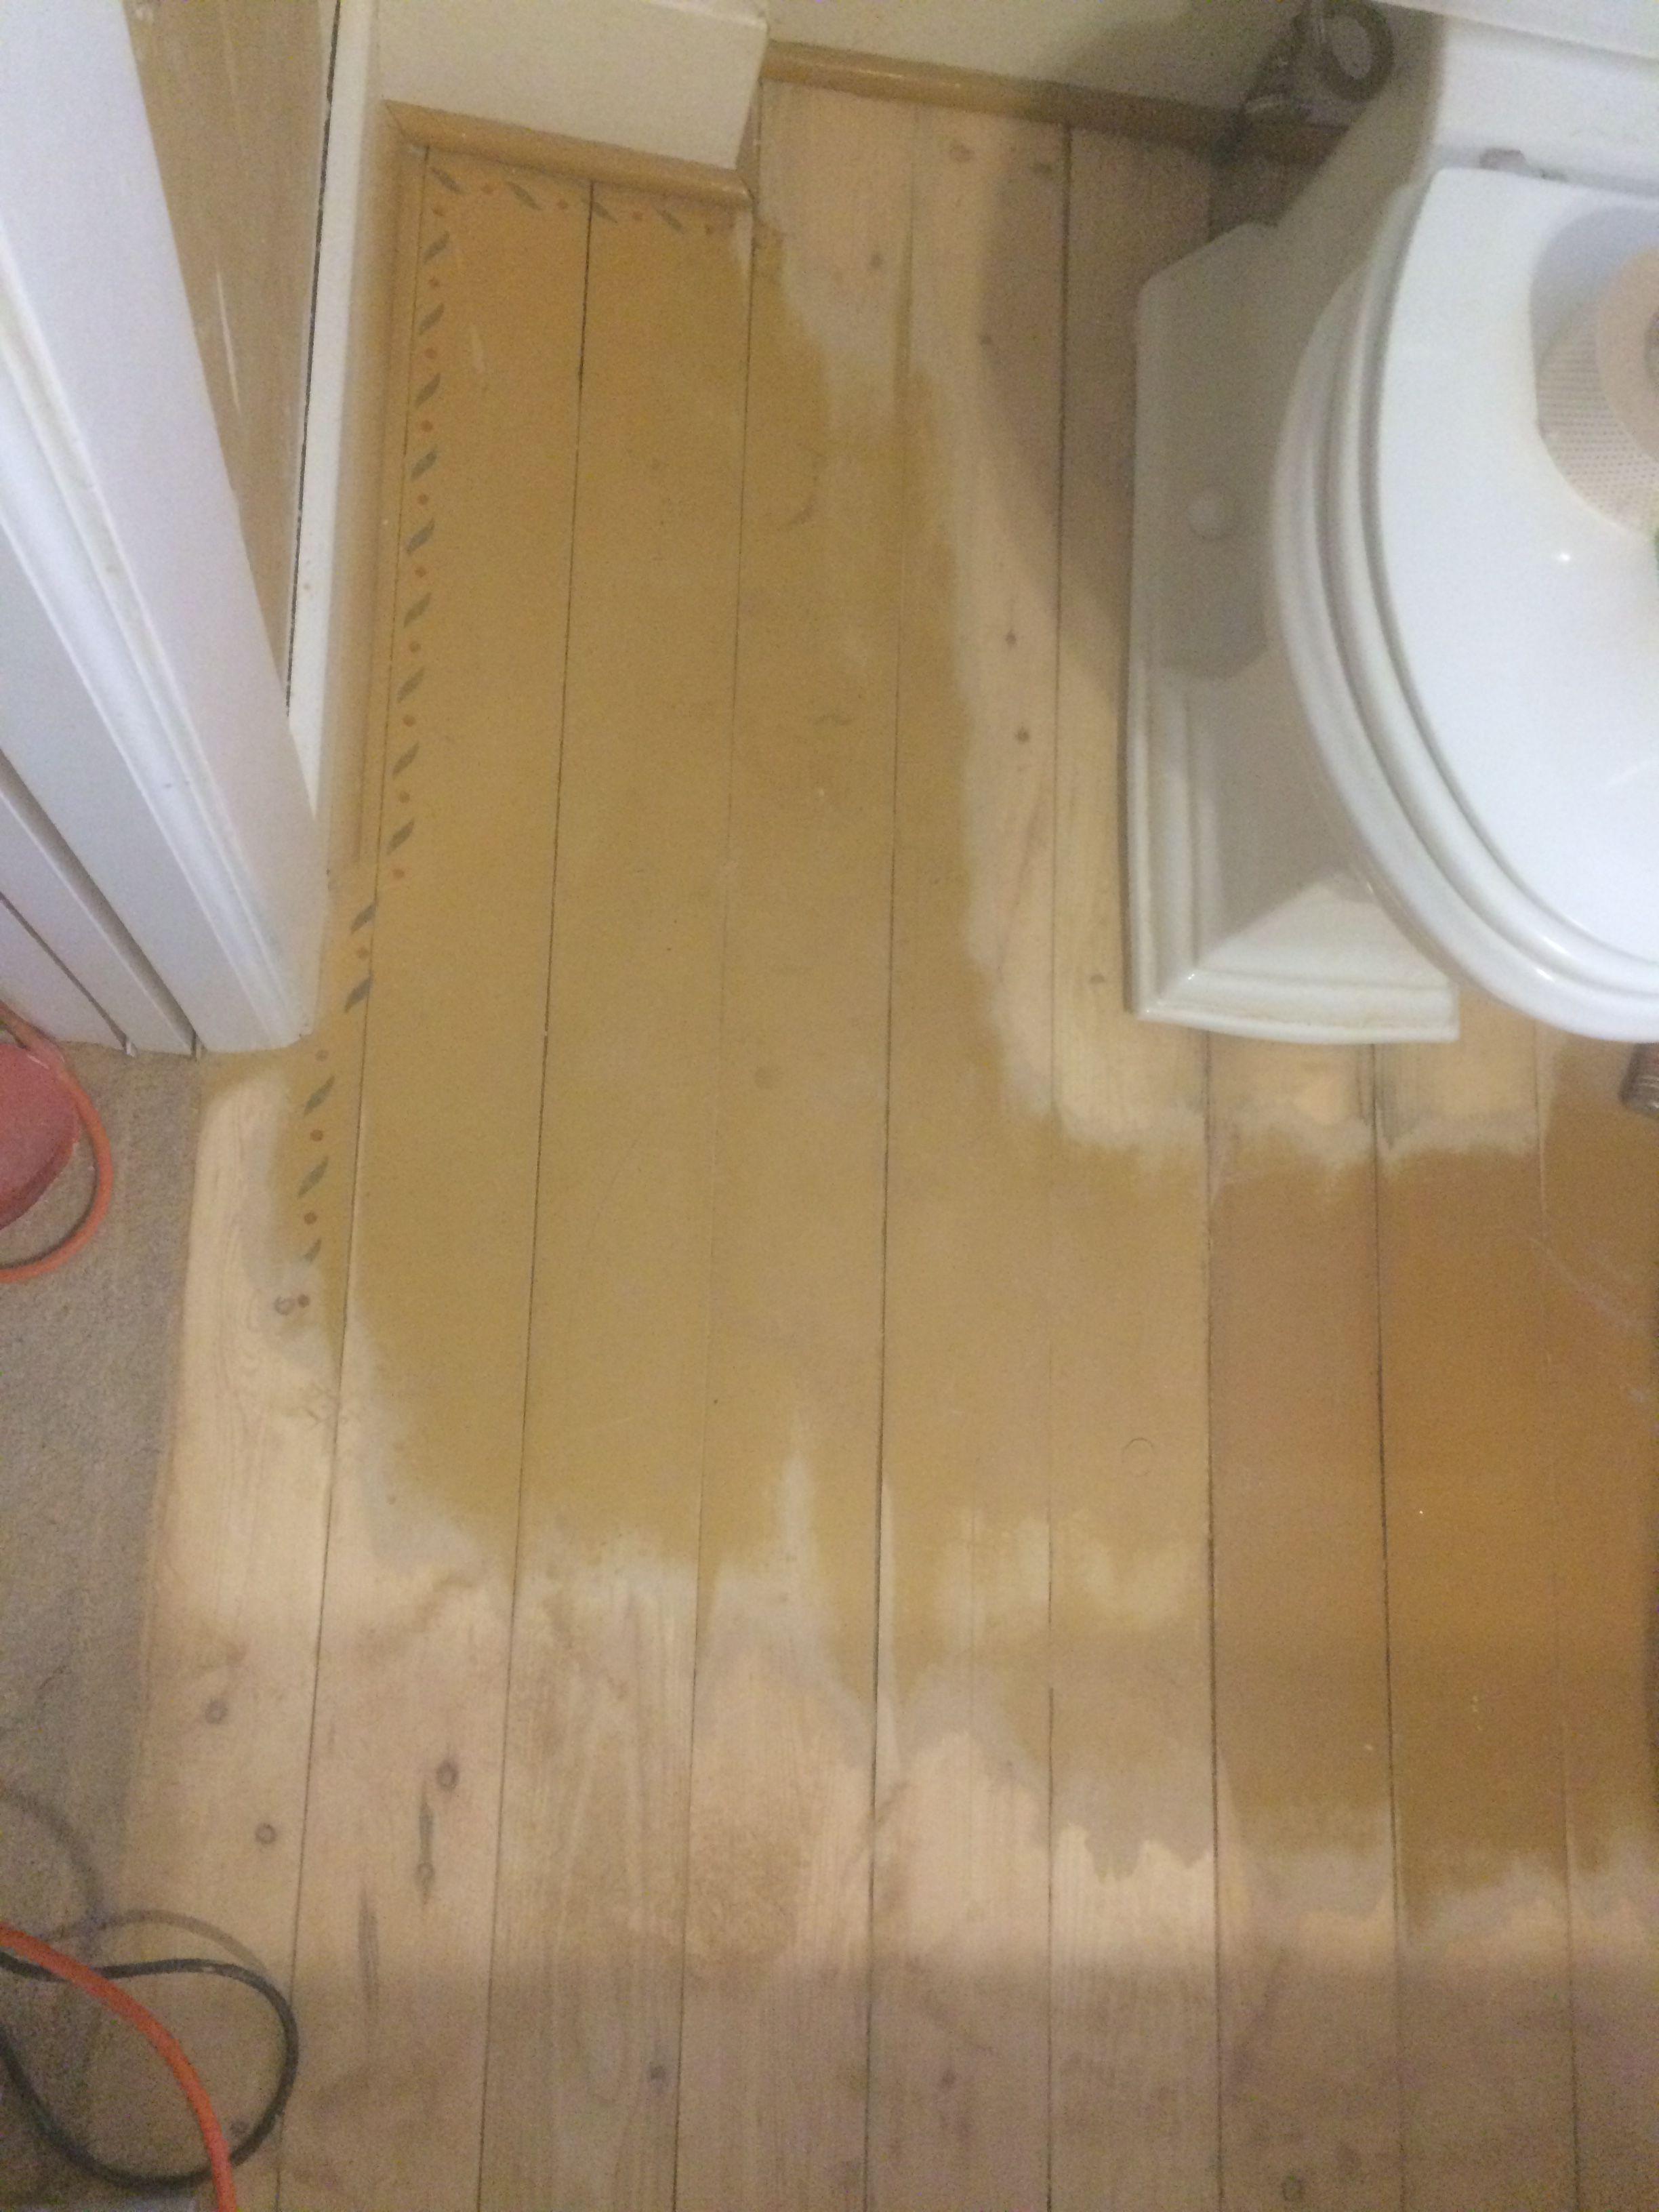 Sanding The Painted Floor Major Sawdust Bathroom Restoration Flooring Vintage Bathroom